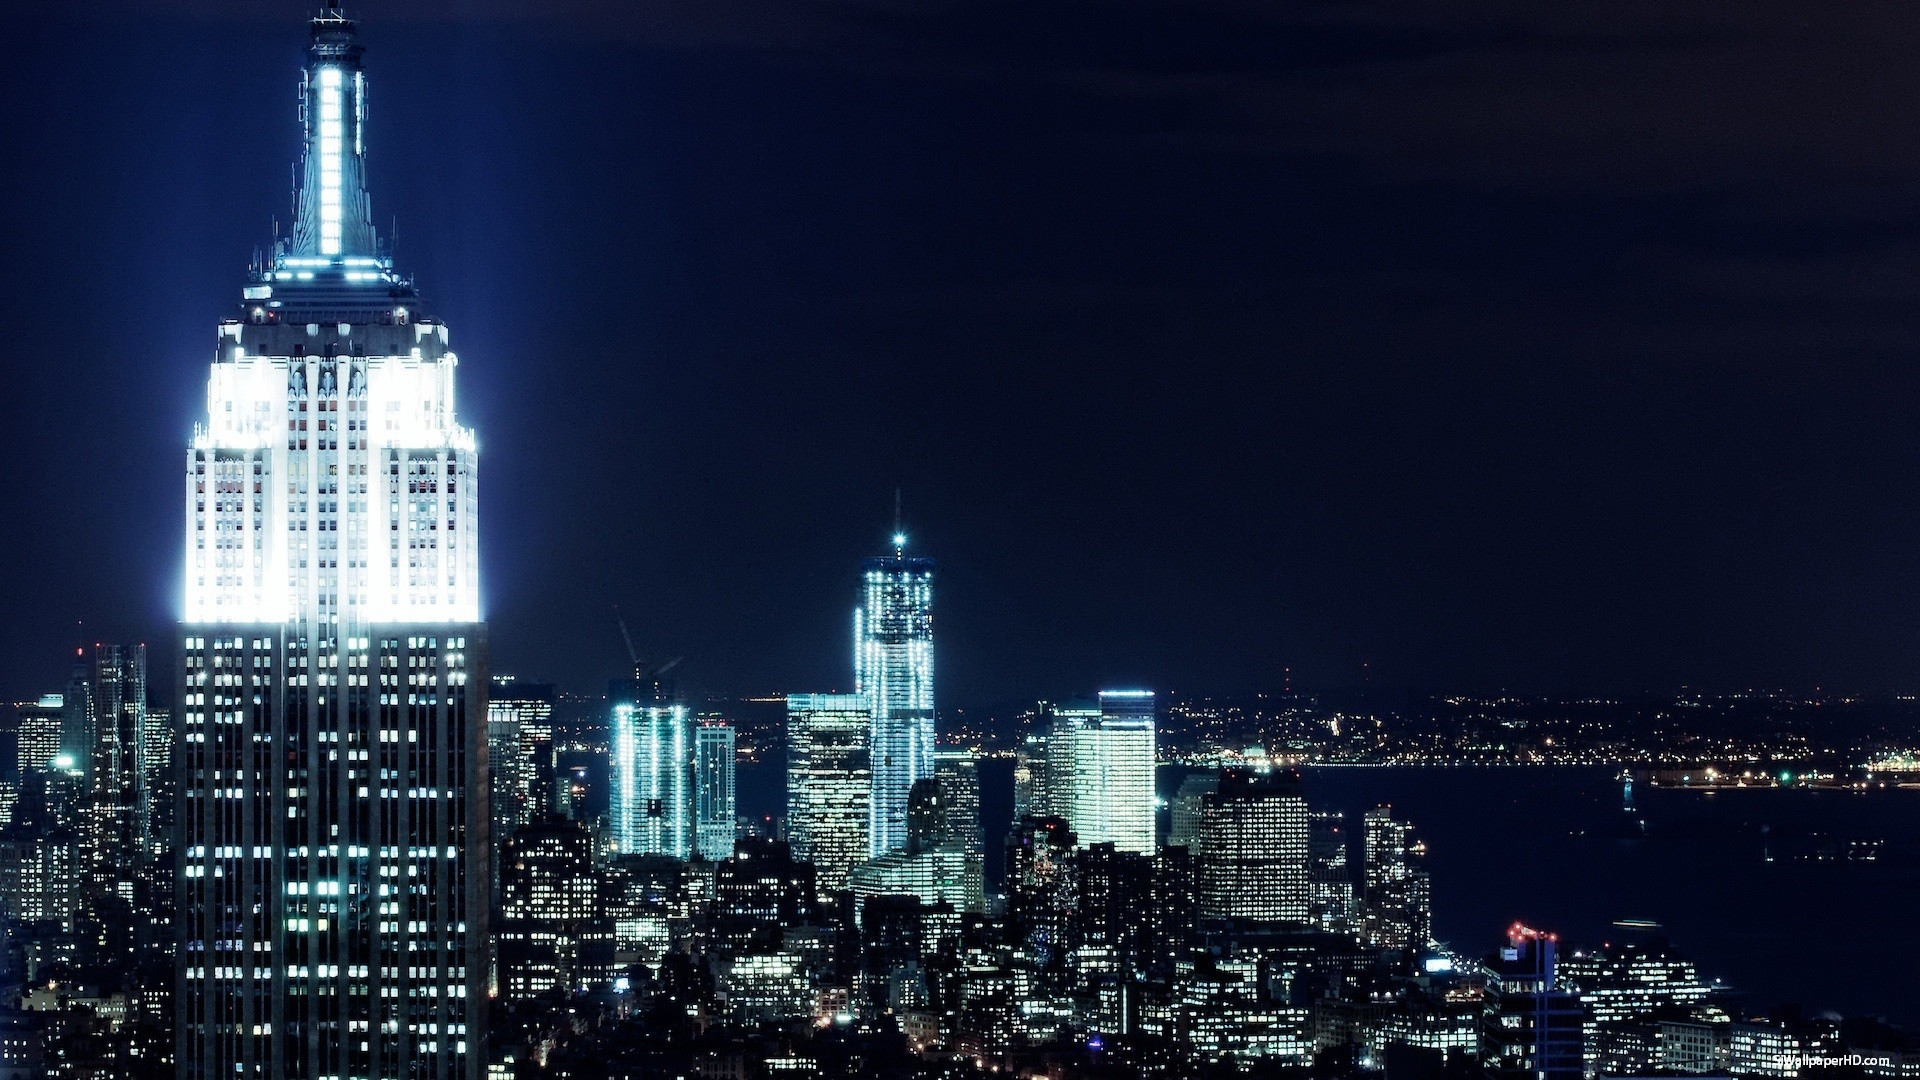 High Resolution New York City Skyline Wallpaper HD 17 Image Full .